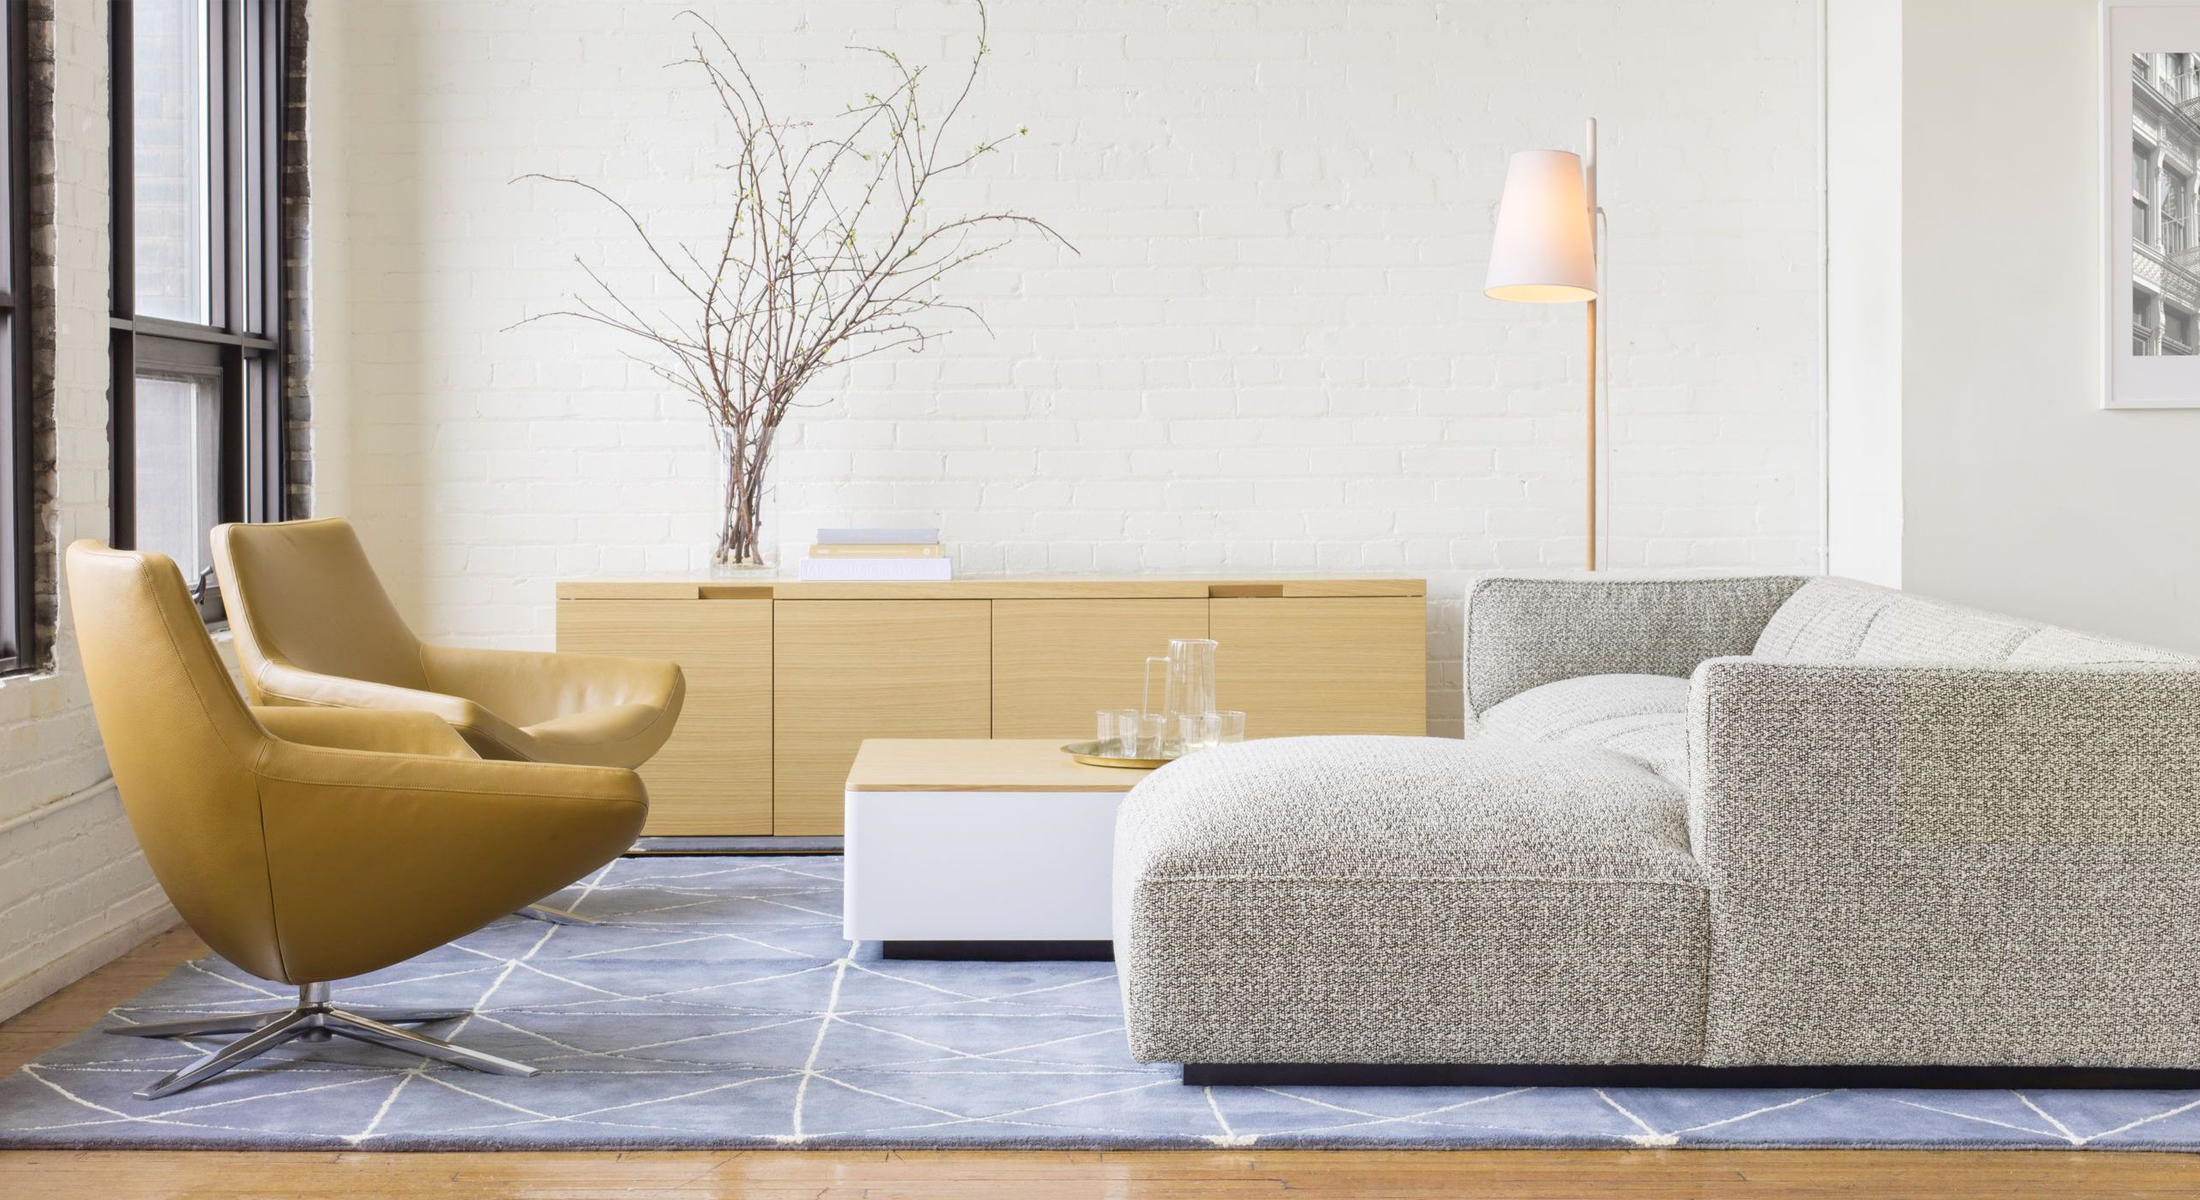 Peachy Studio Tk Broadens Portfolio With New And Enhanced Products Ibusinesslaw Wood Chair Design Ideas Ibusinesslaworg